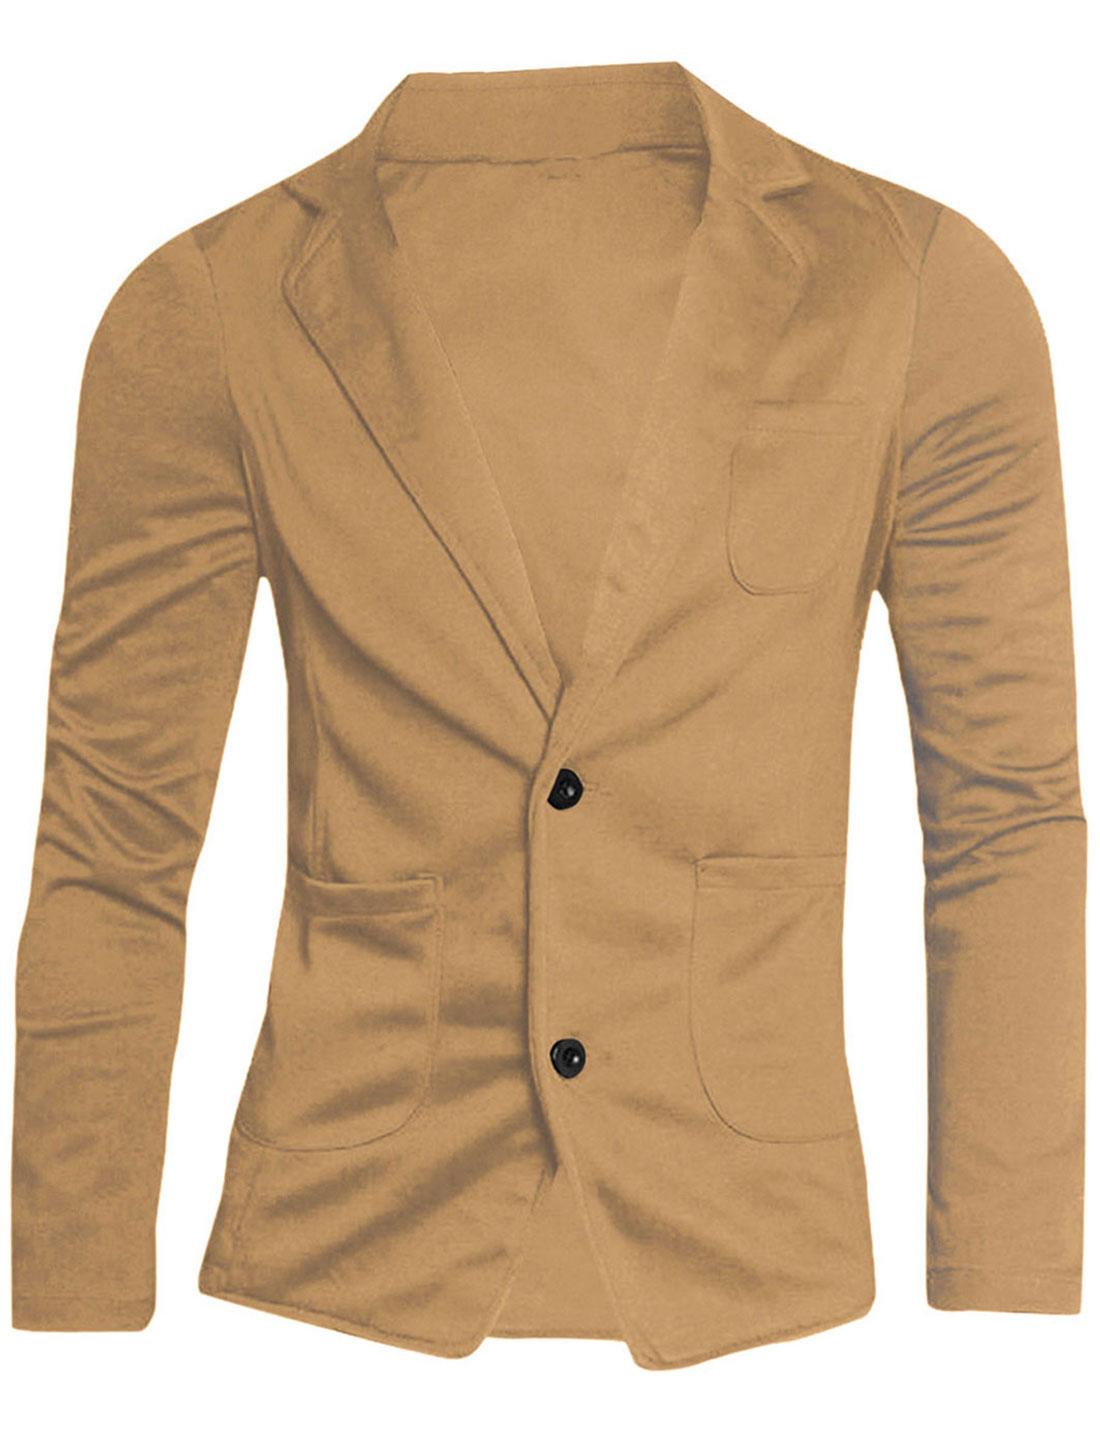 Men Notched Lapel Solid Color Long Sleeve Knit Blazer Beige 40